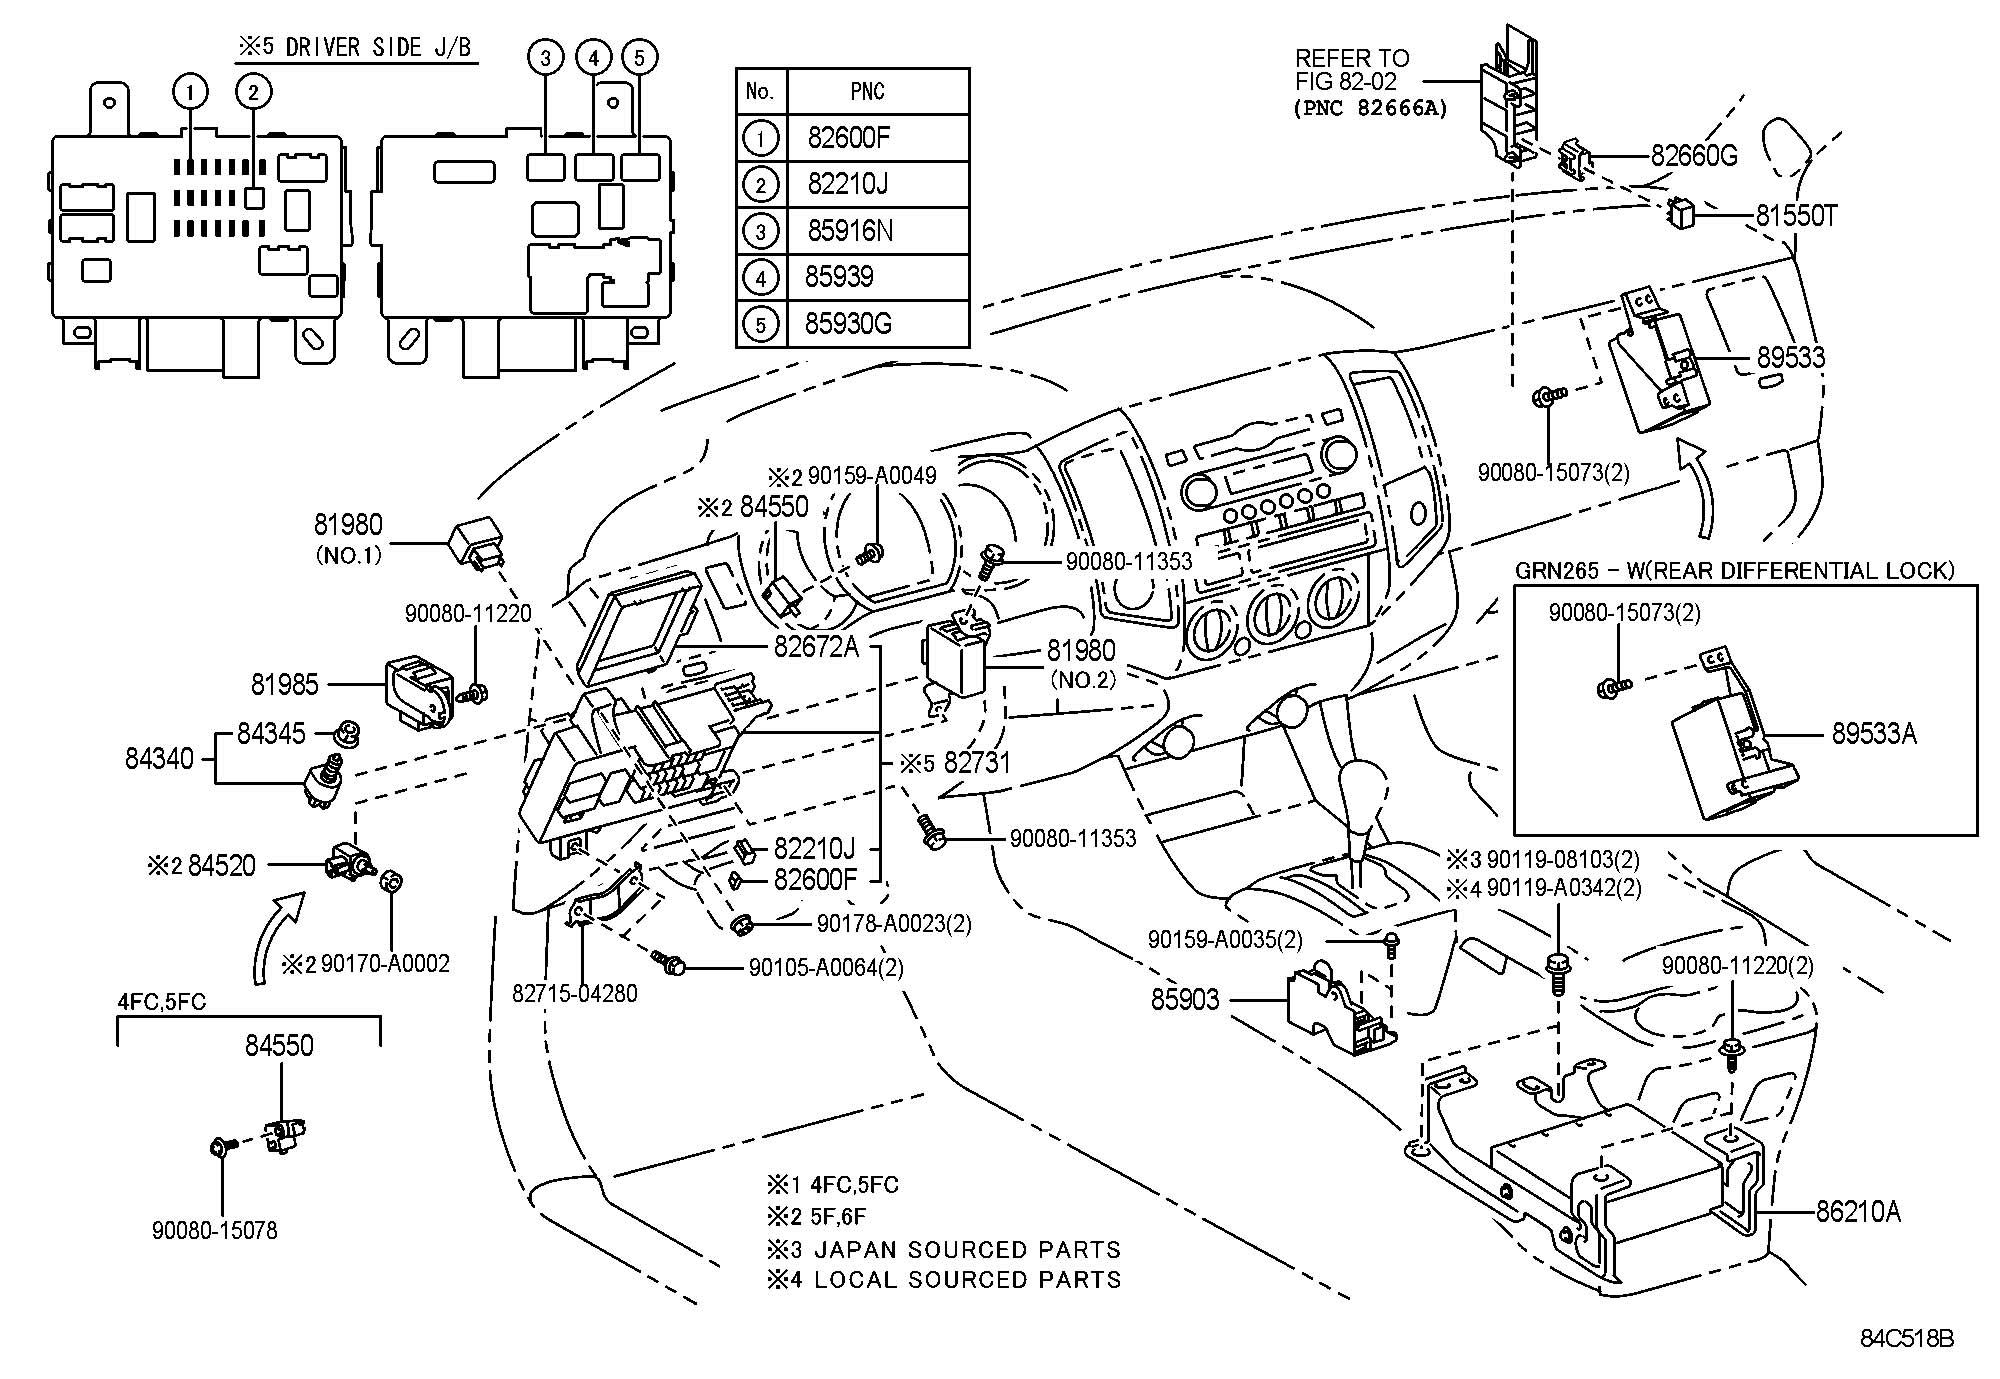 Toyota Tacoma Flasher assembly, turn signal. Flasher